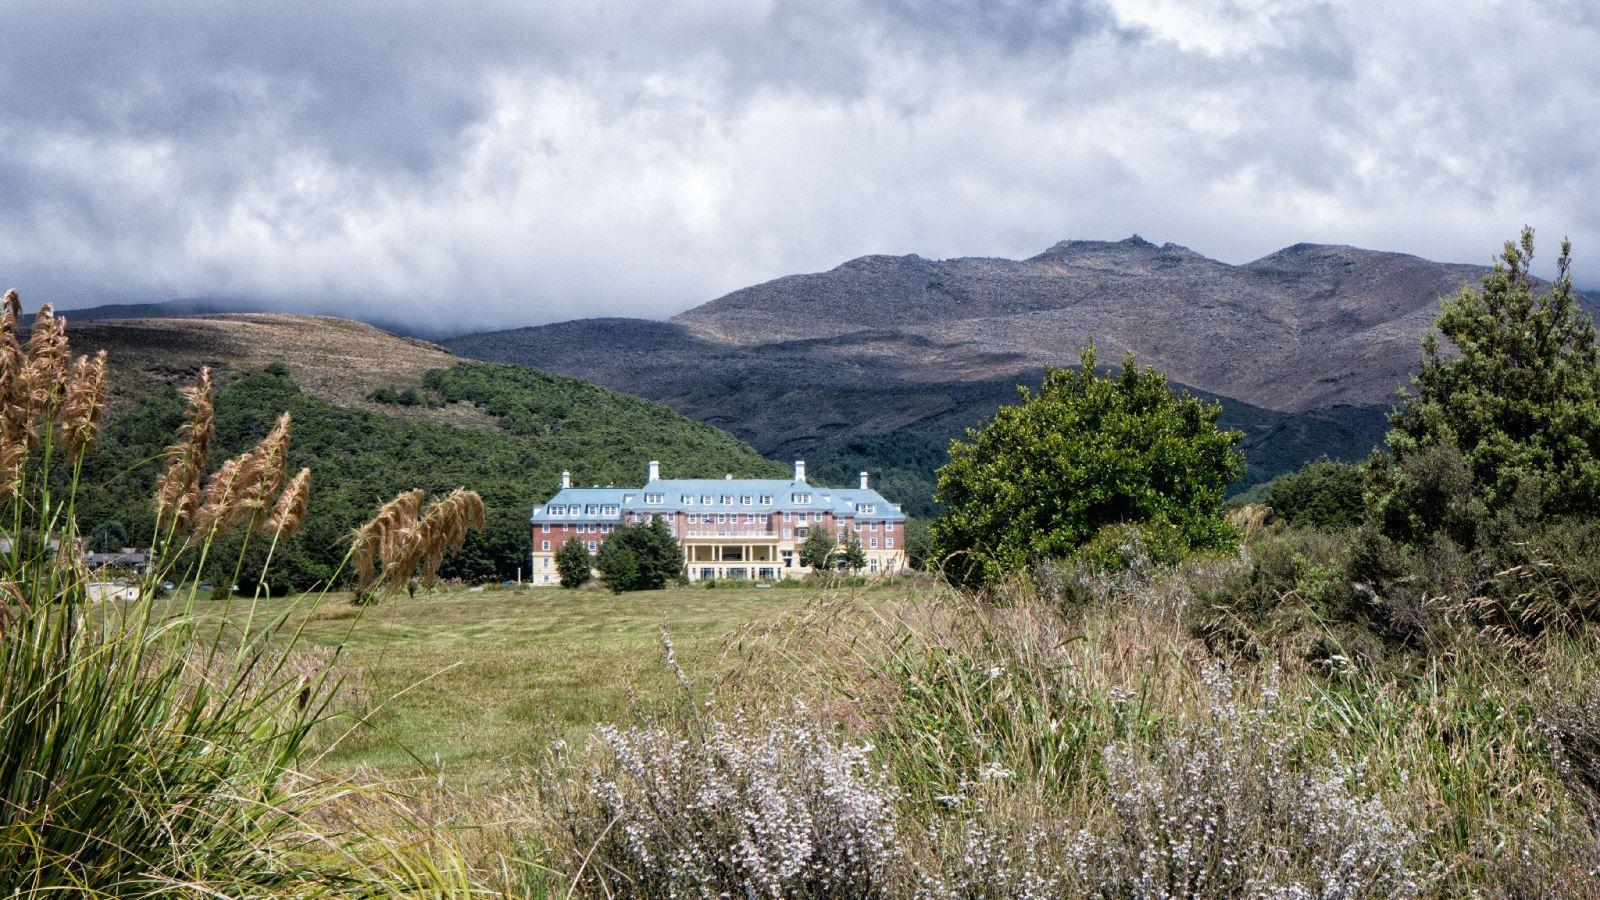 The Grand Chateau Tongariro January 2021